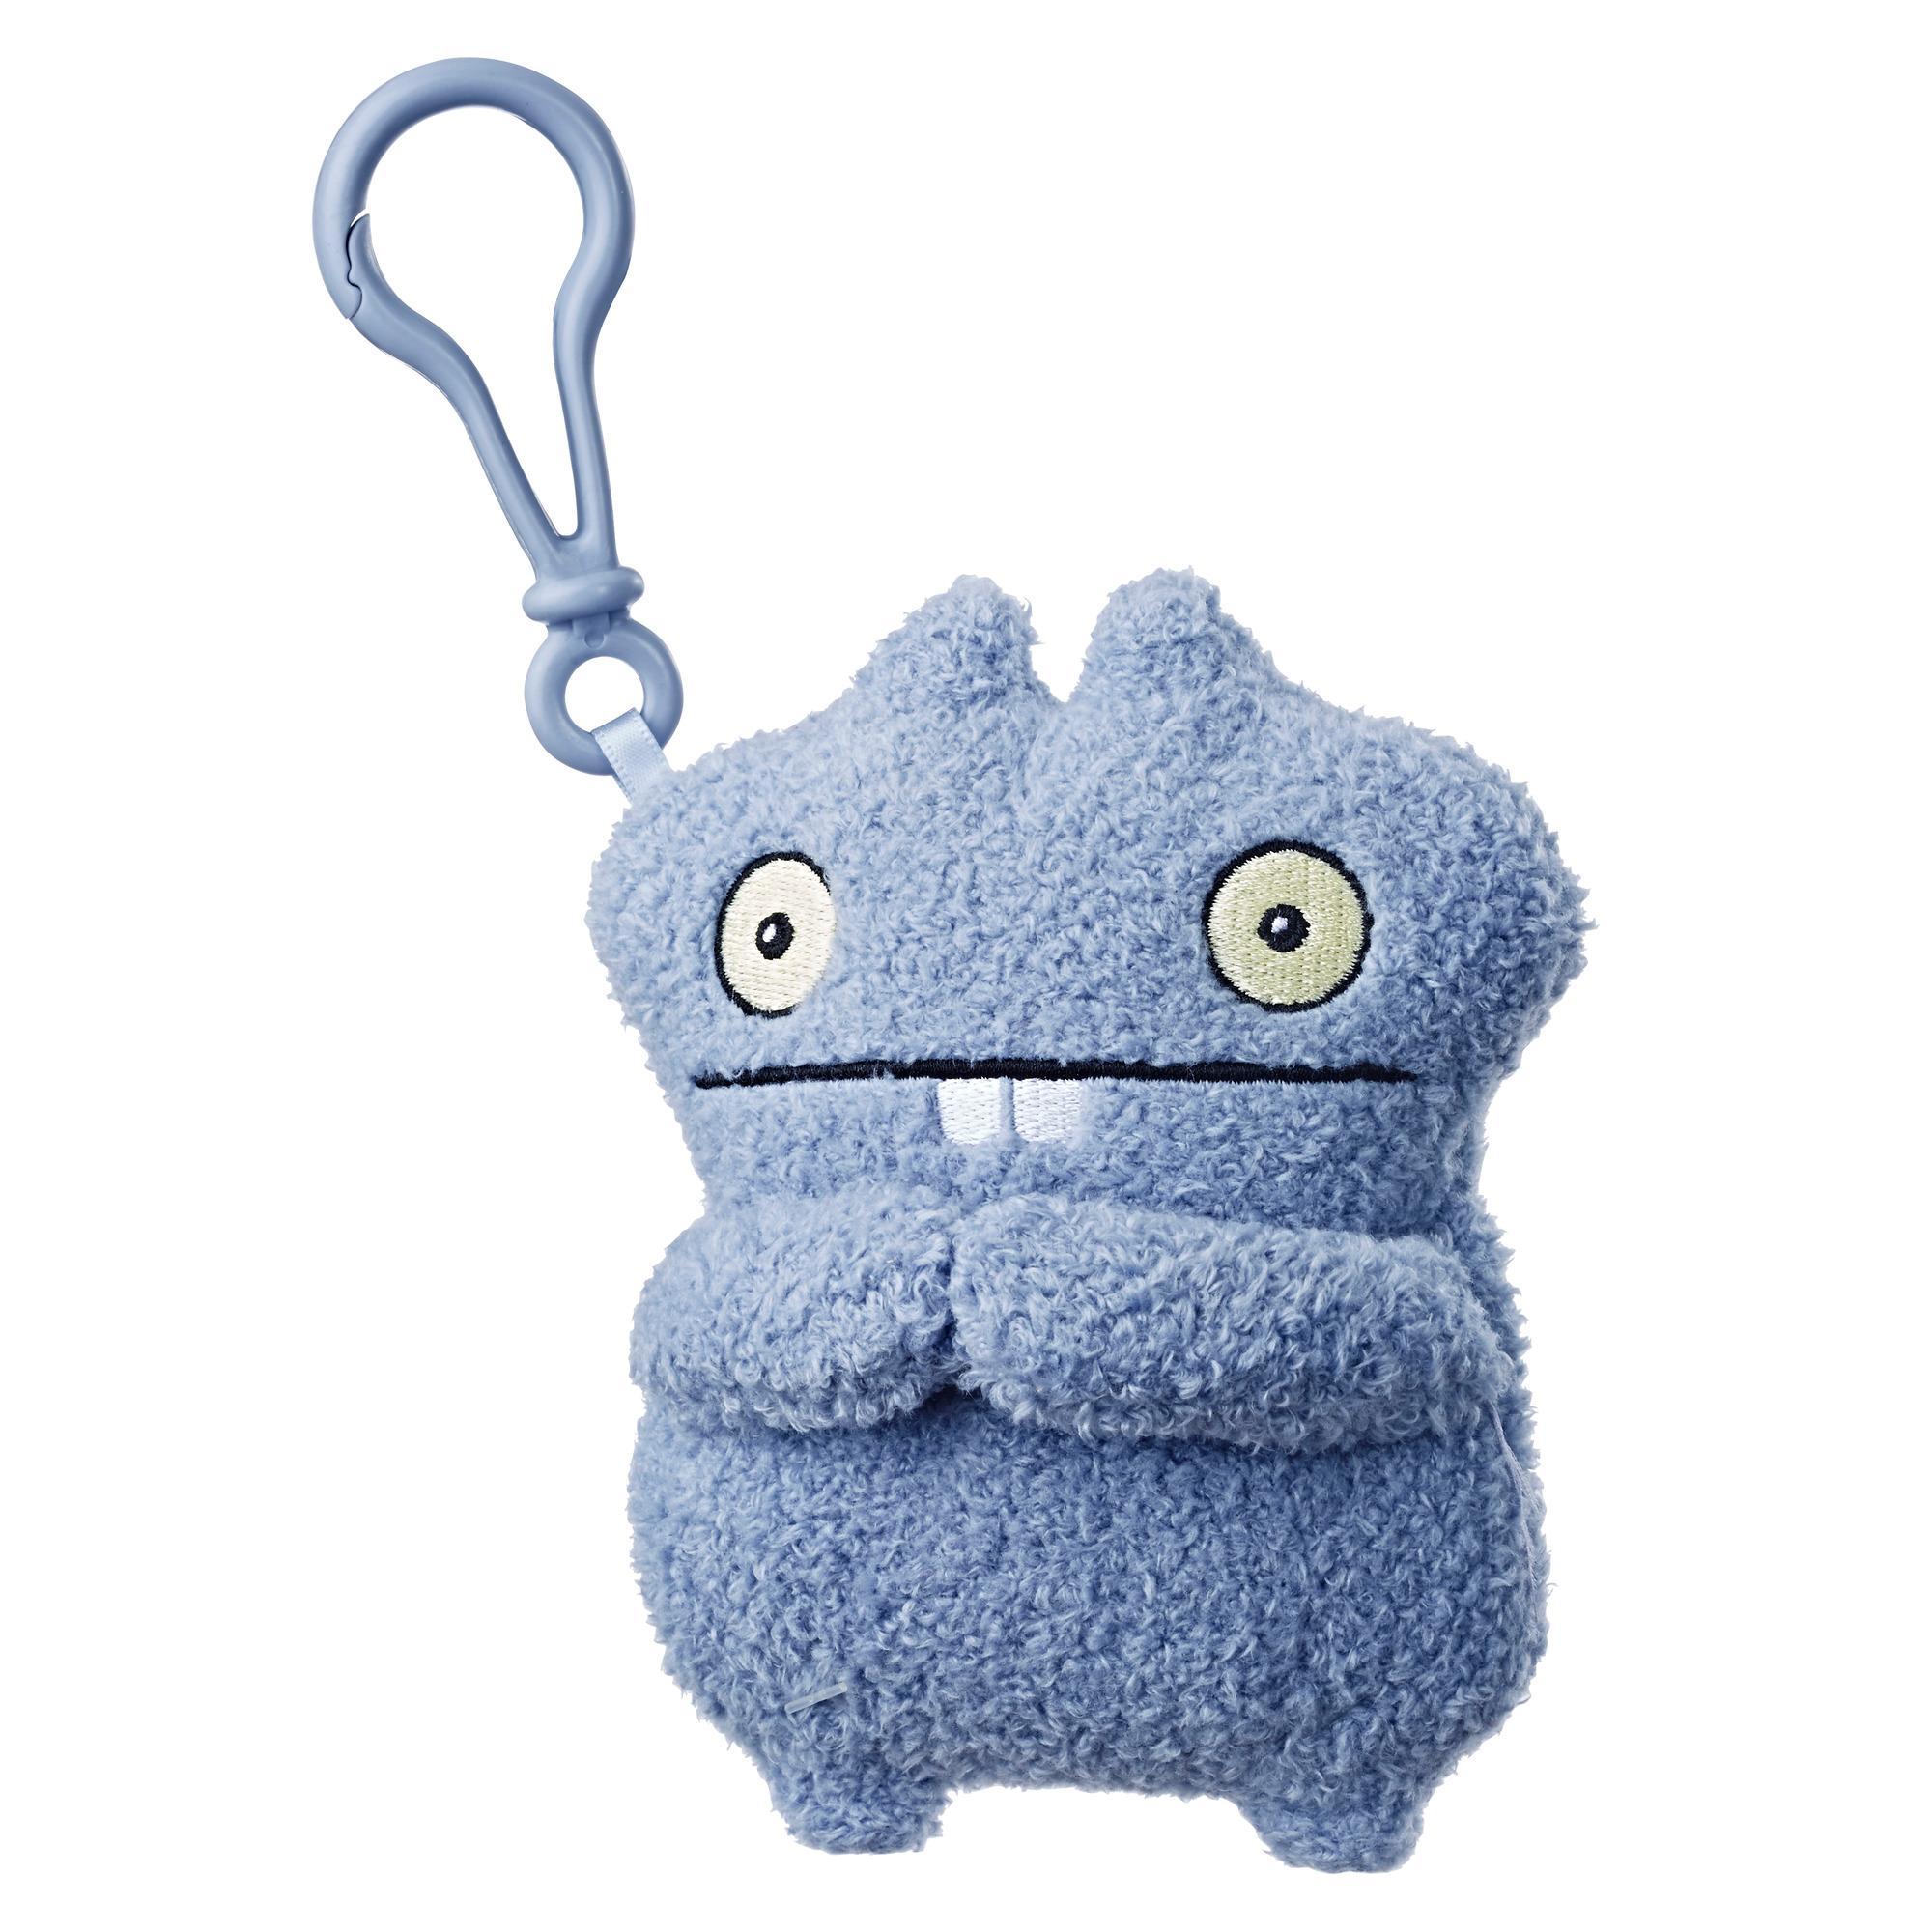 UglyDolls Babo Para Levar - Brinquedo de Pelúcia de 13 cm